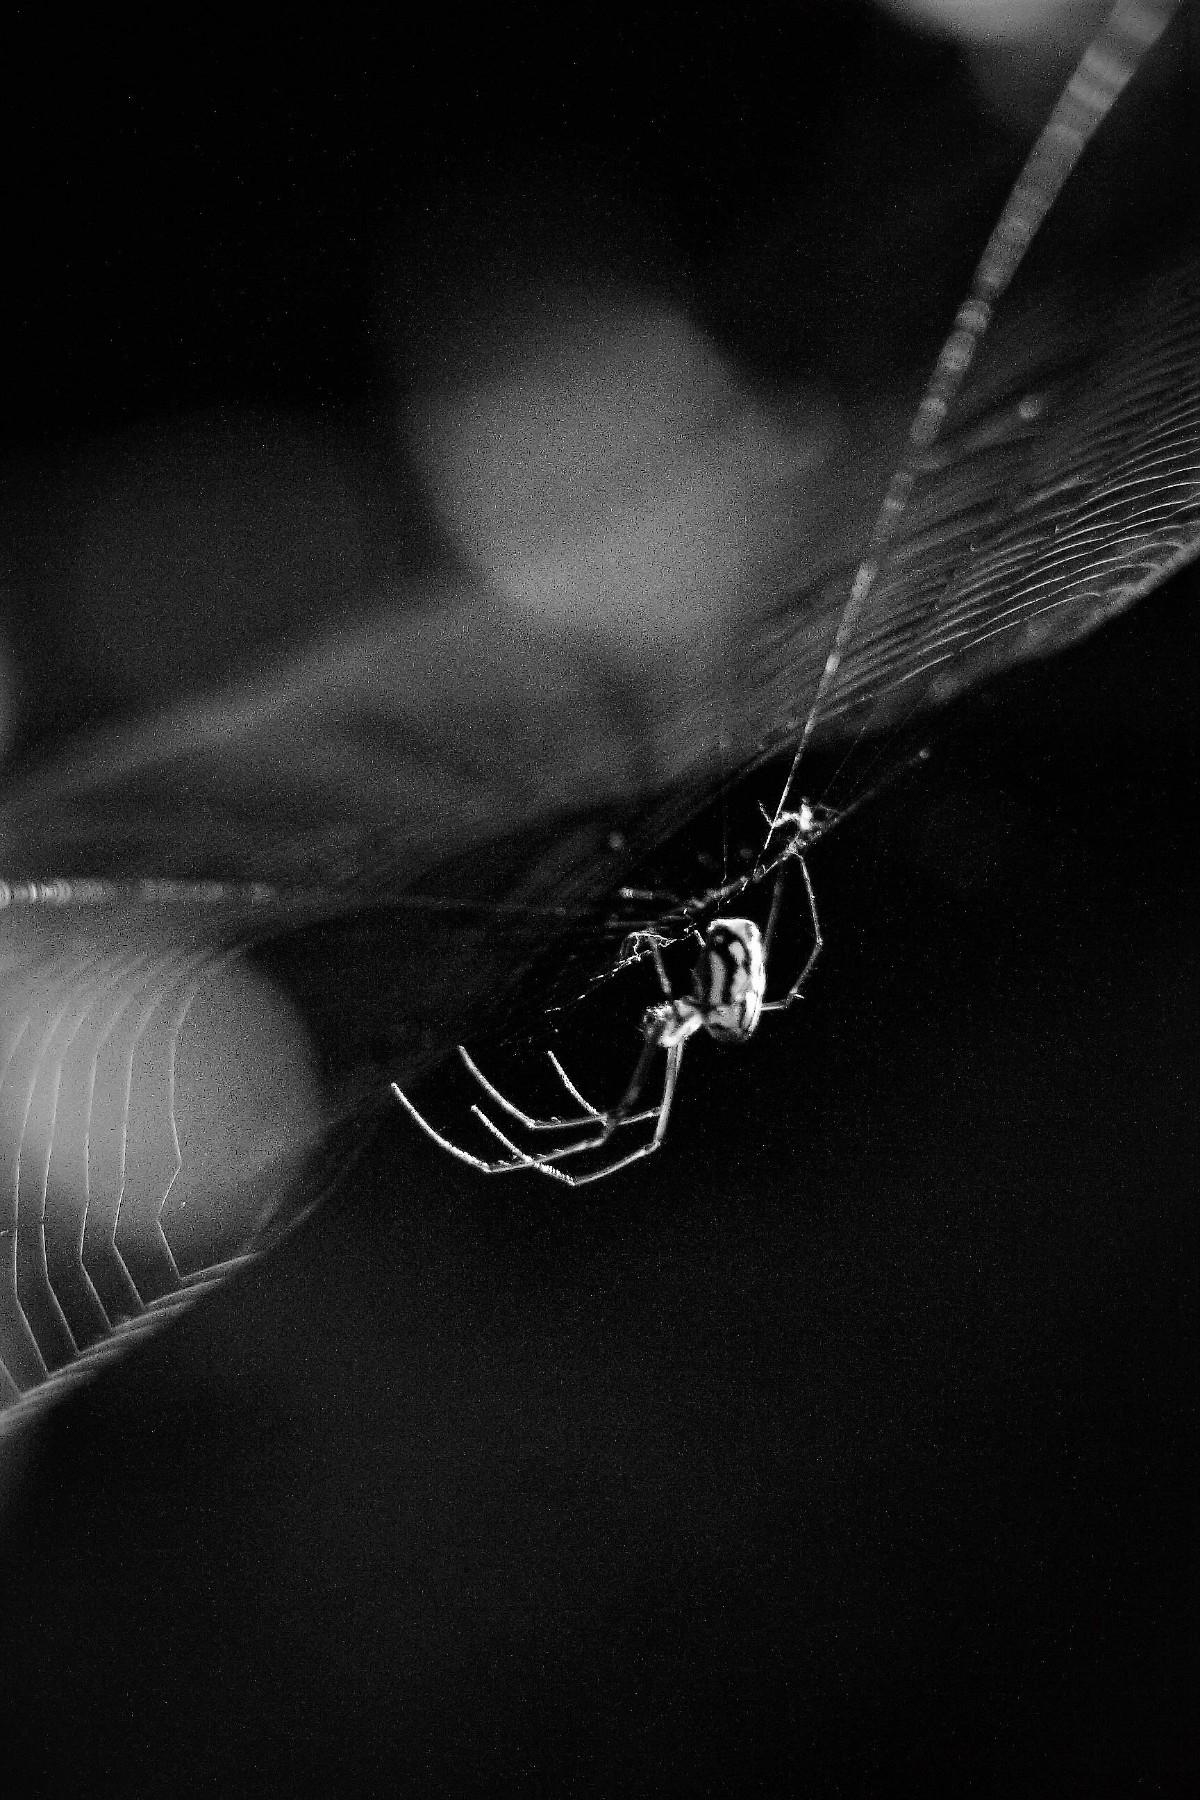 Orbweaver black white - twerts | ello